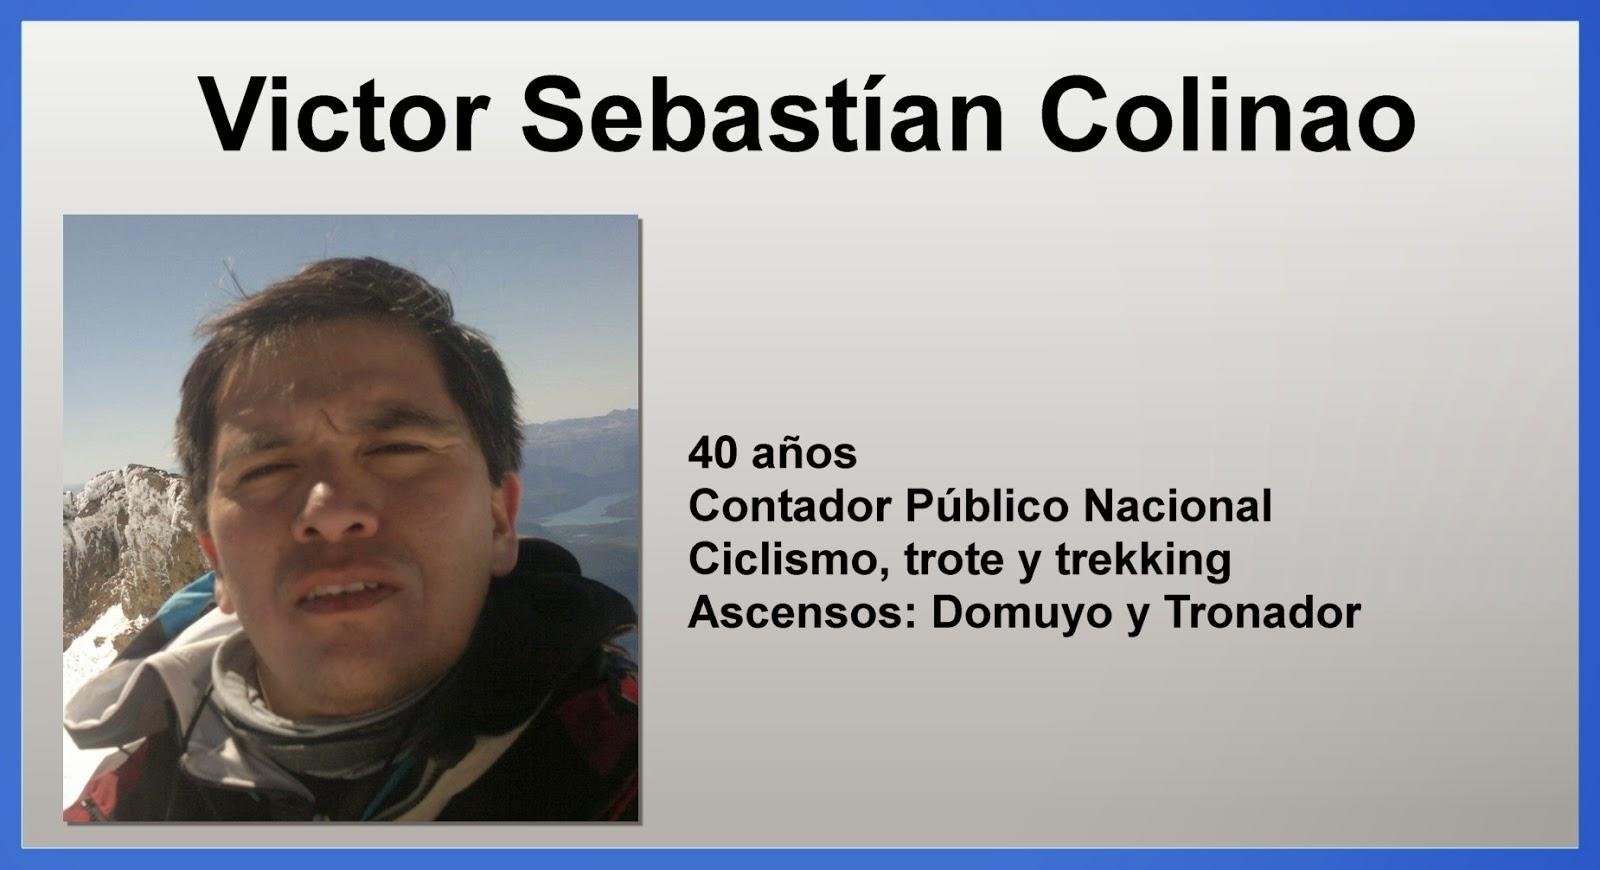 https://www.facebook.com/victor.s.collinao?fref=ts